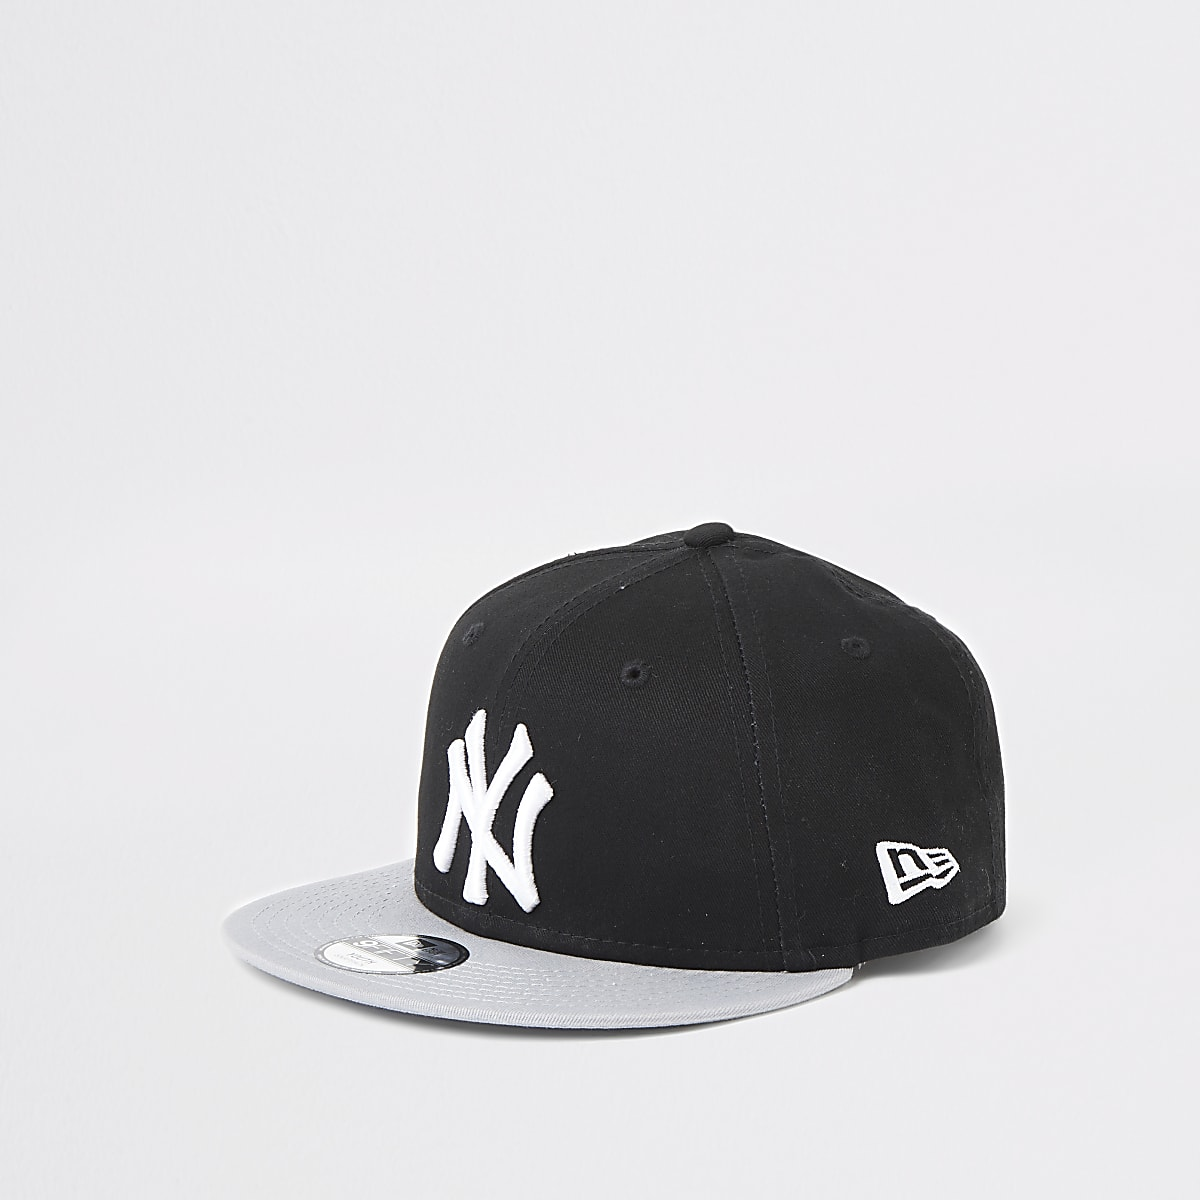 New Era – Schwarze Kappe